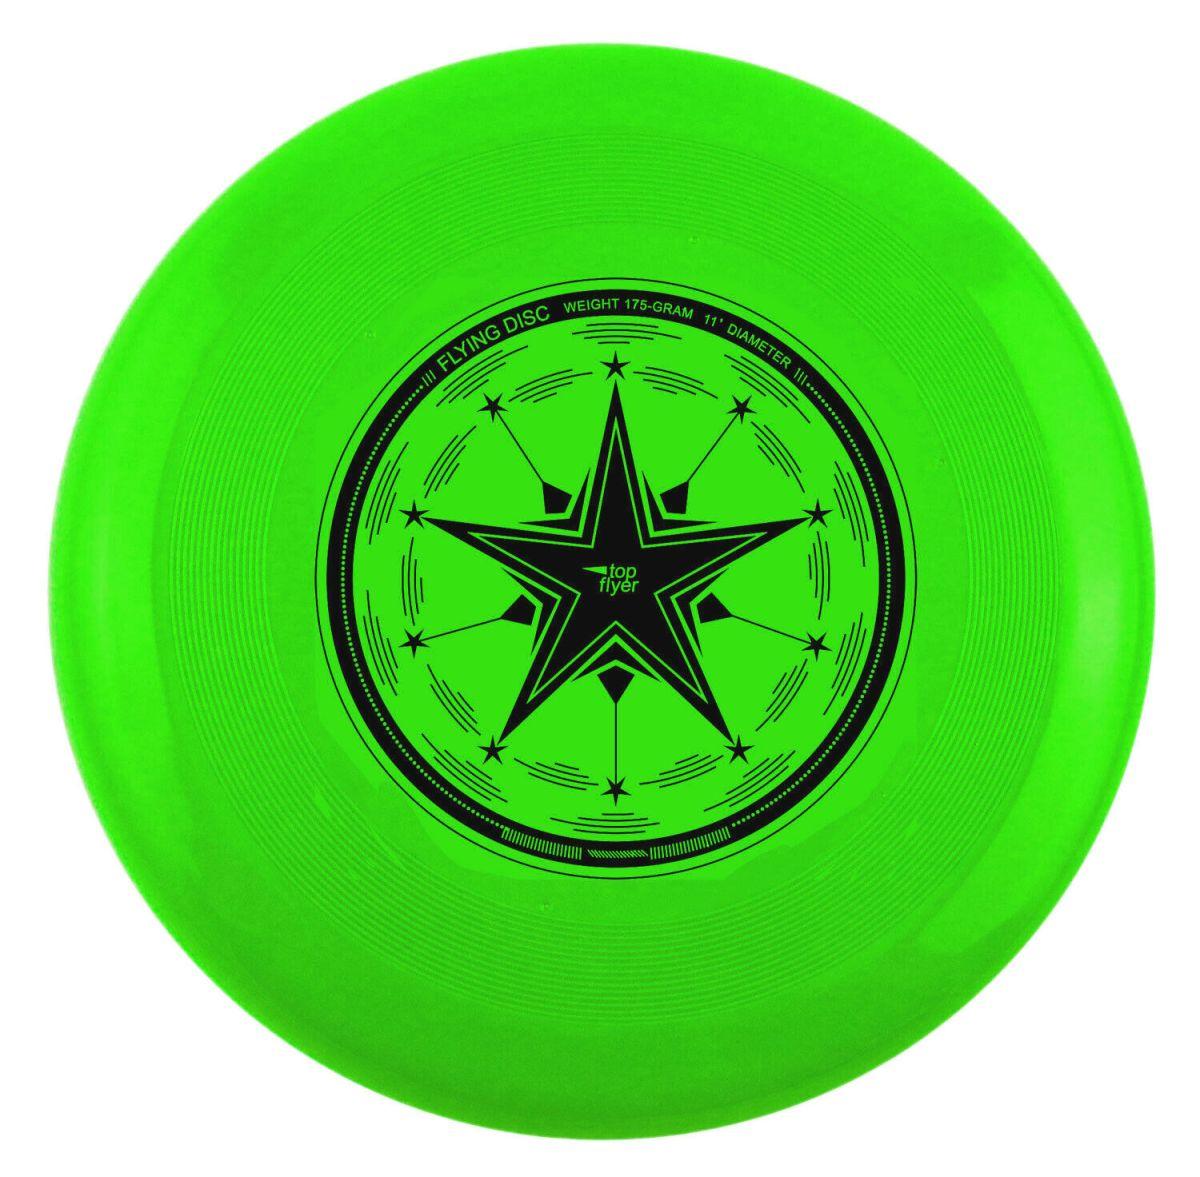 top flyer Profi 175g Ultimate Frisbee 27,5 cm (11 Inch) - Wettkampfscheibe TOP